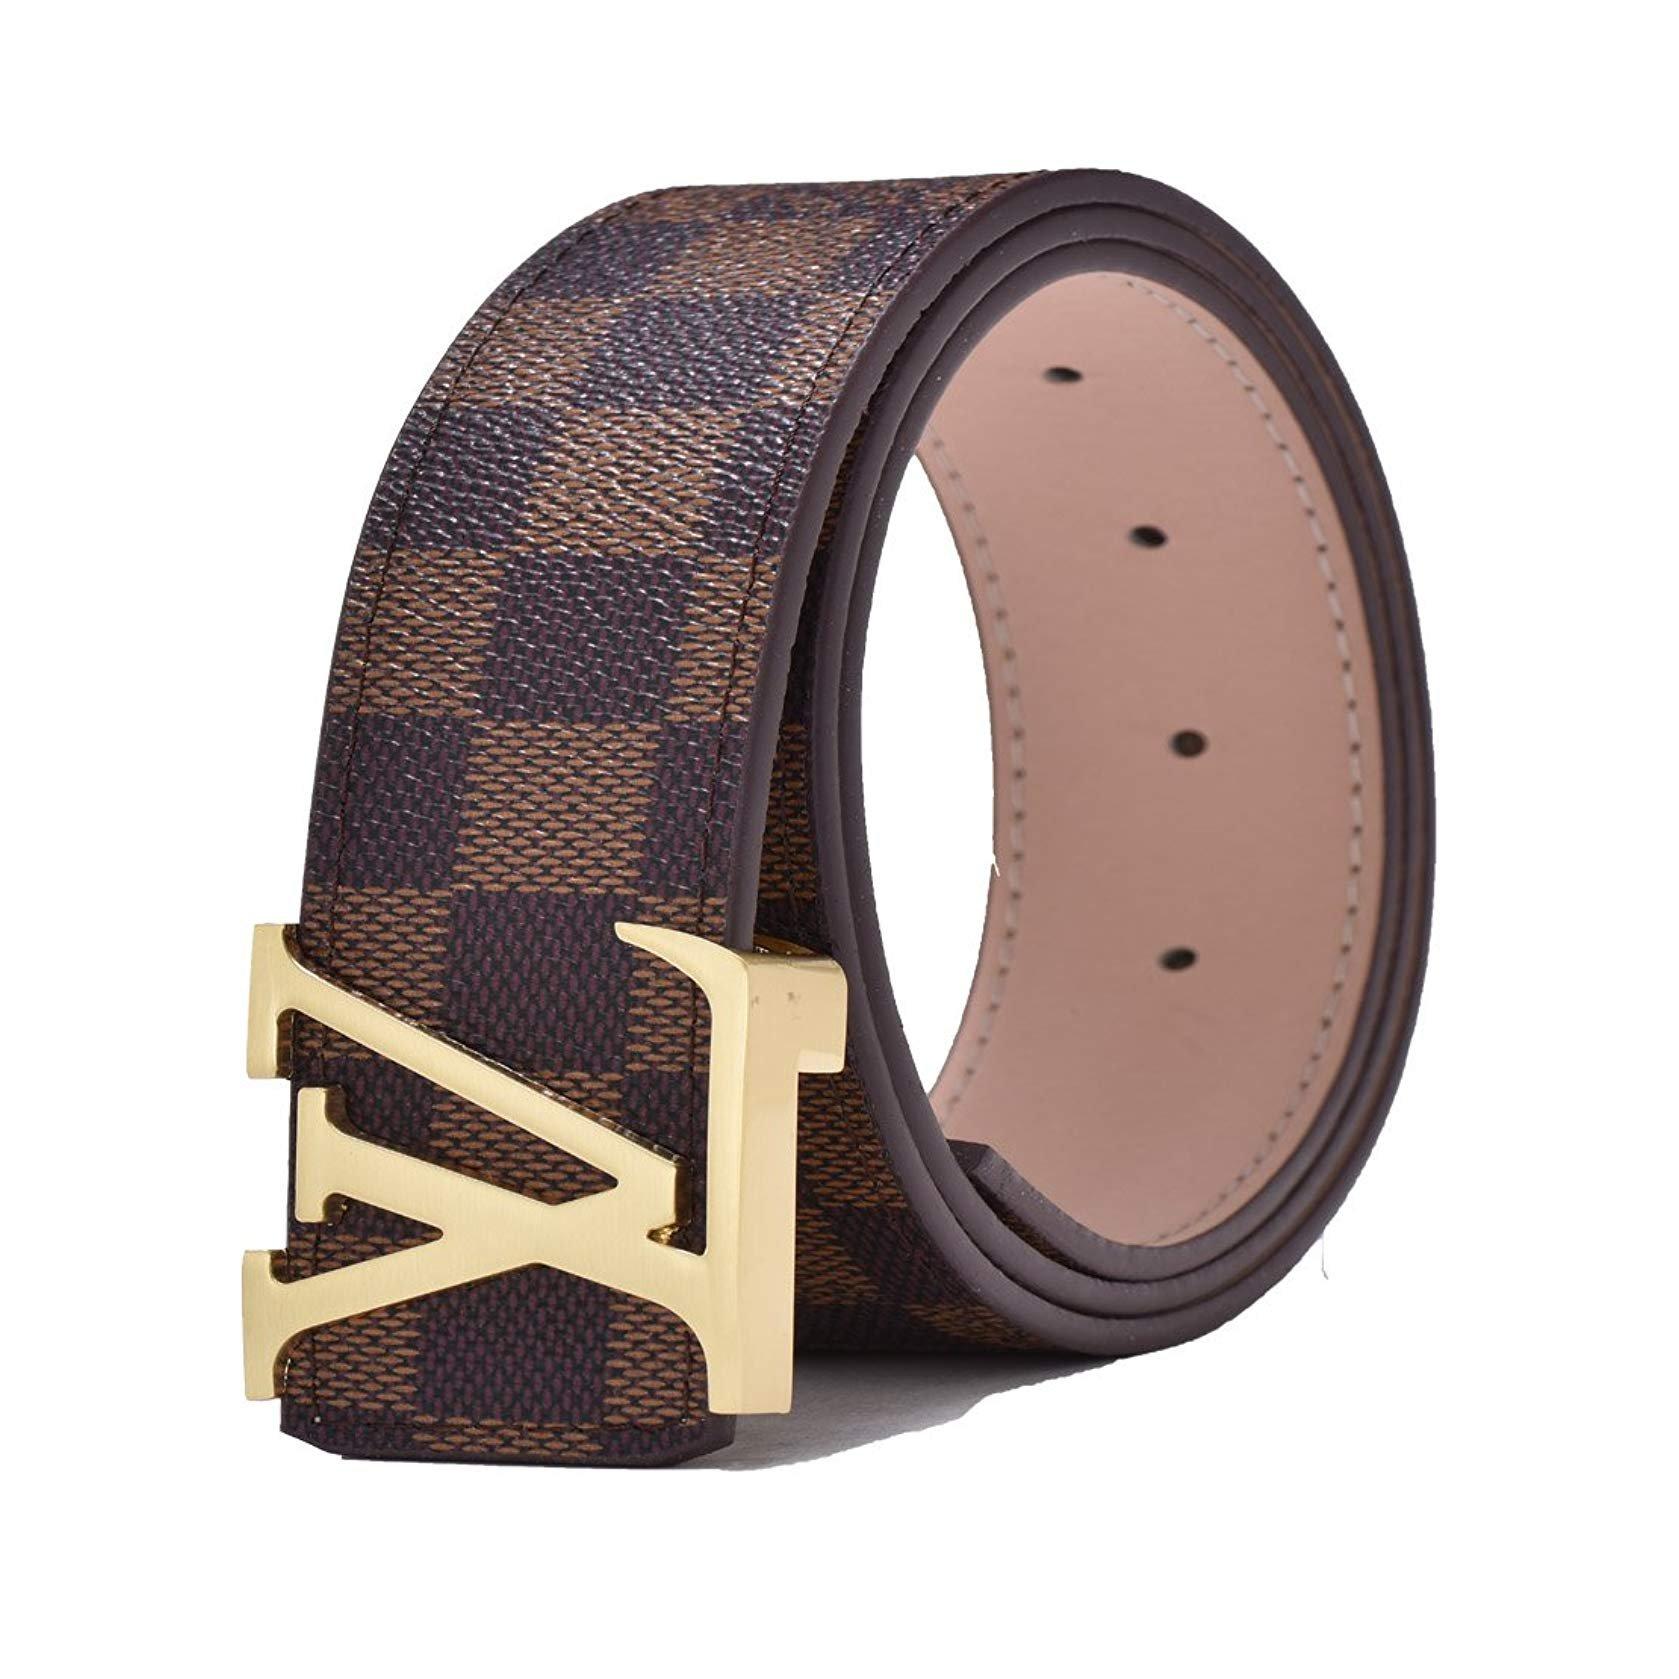 Luxury Designer Checker style Belt for woman man unisex by Sheng Electric Technology Co., Ltd